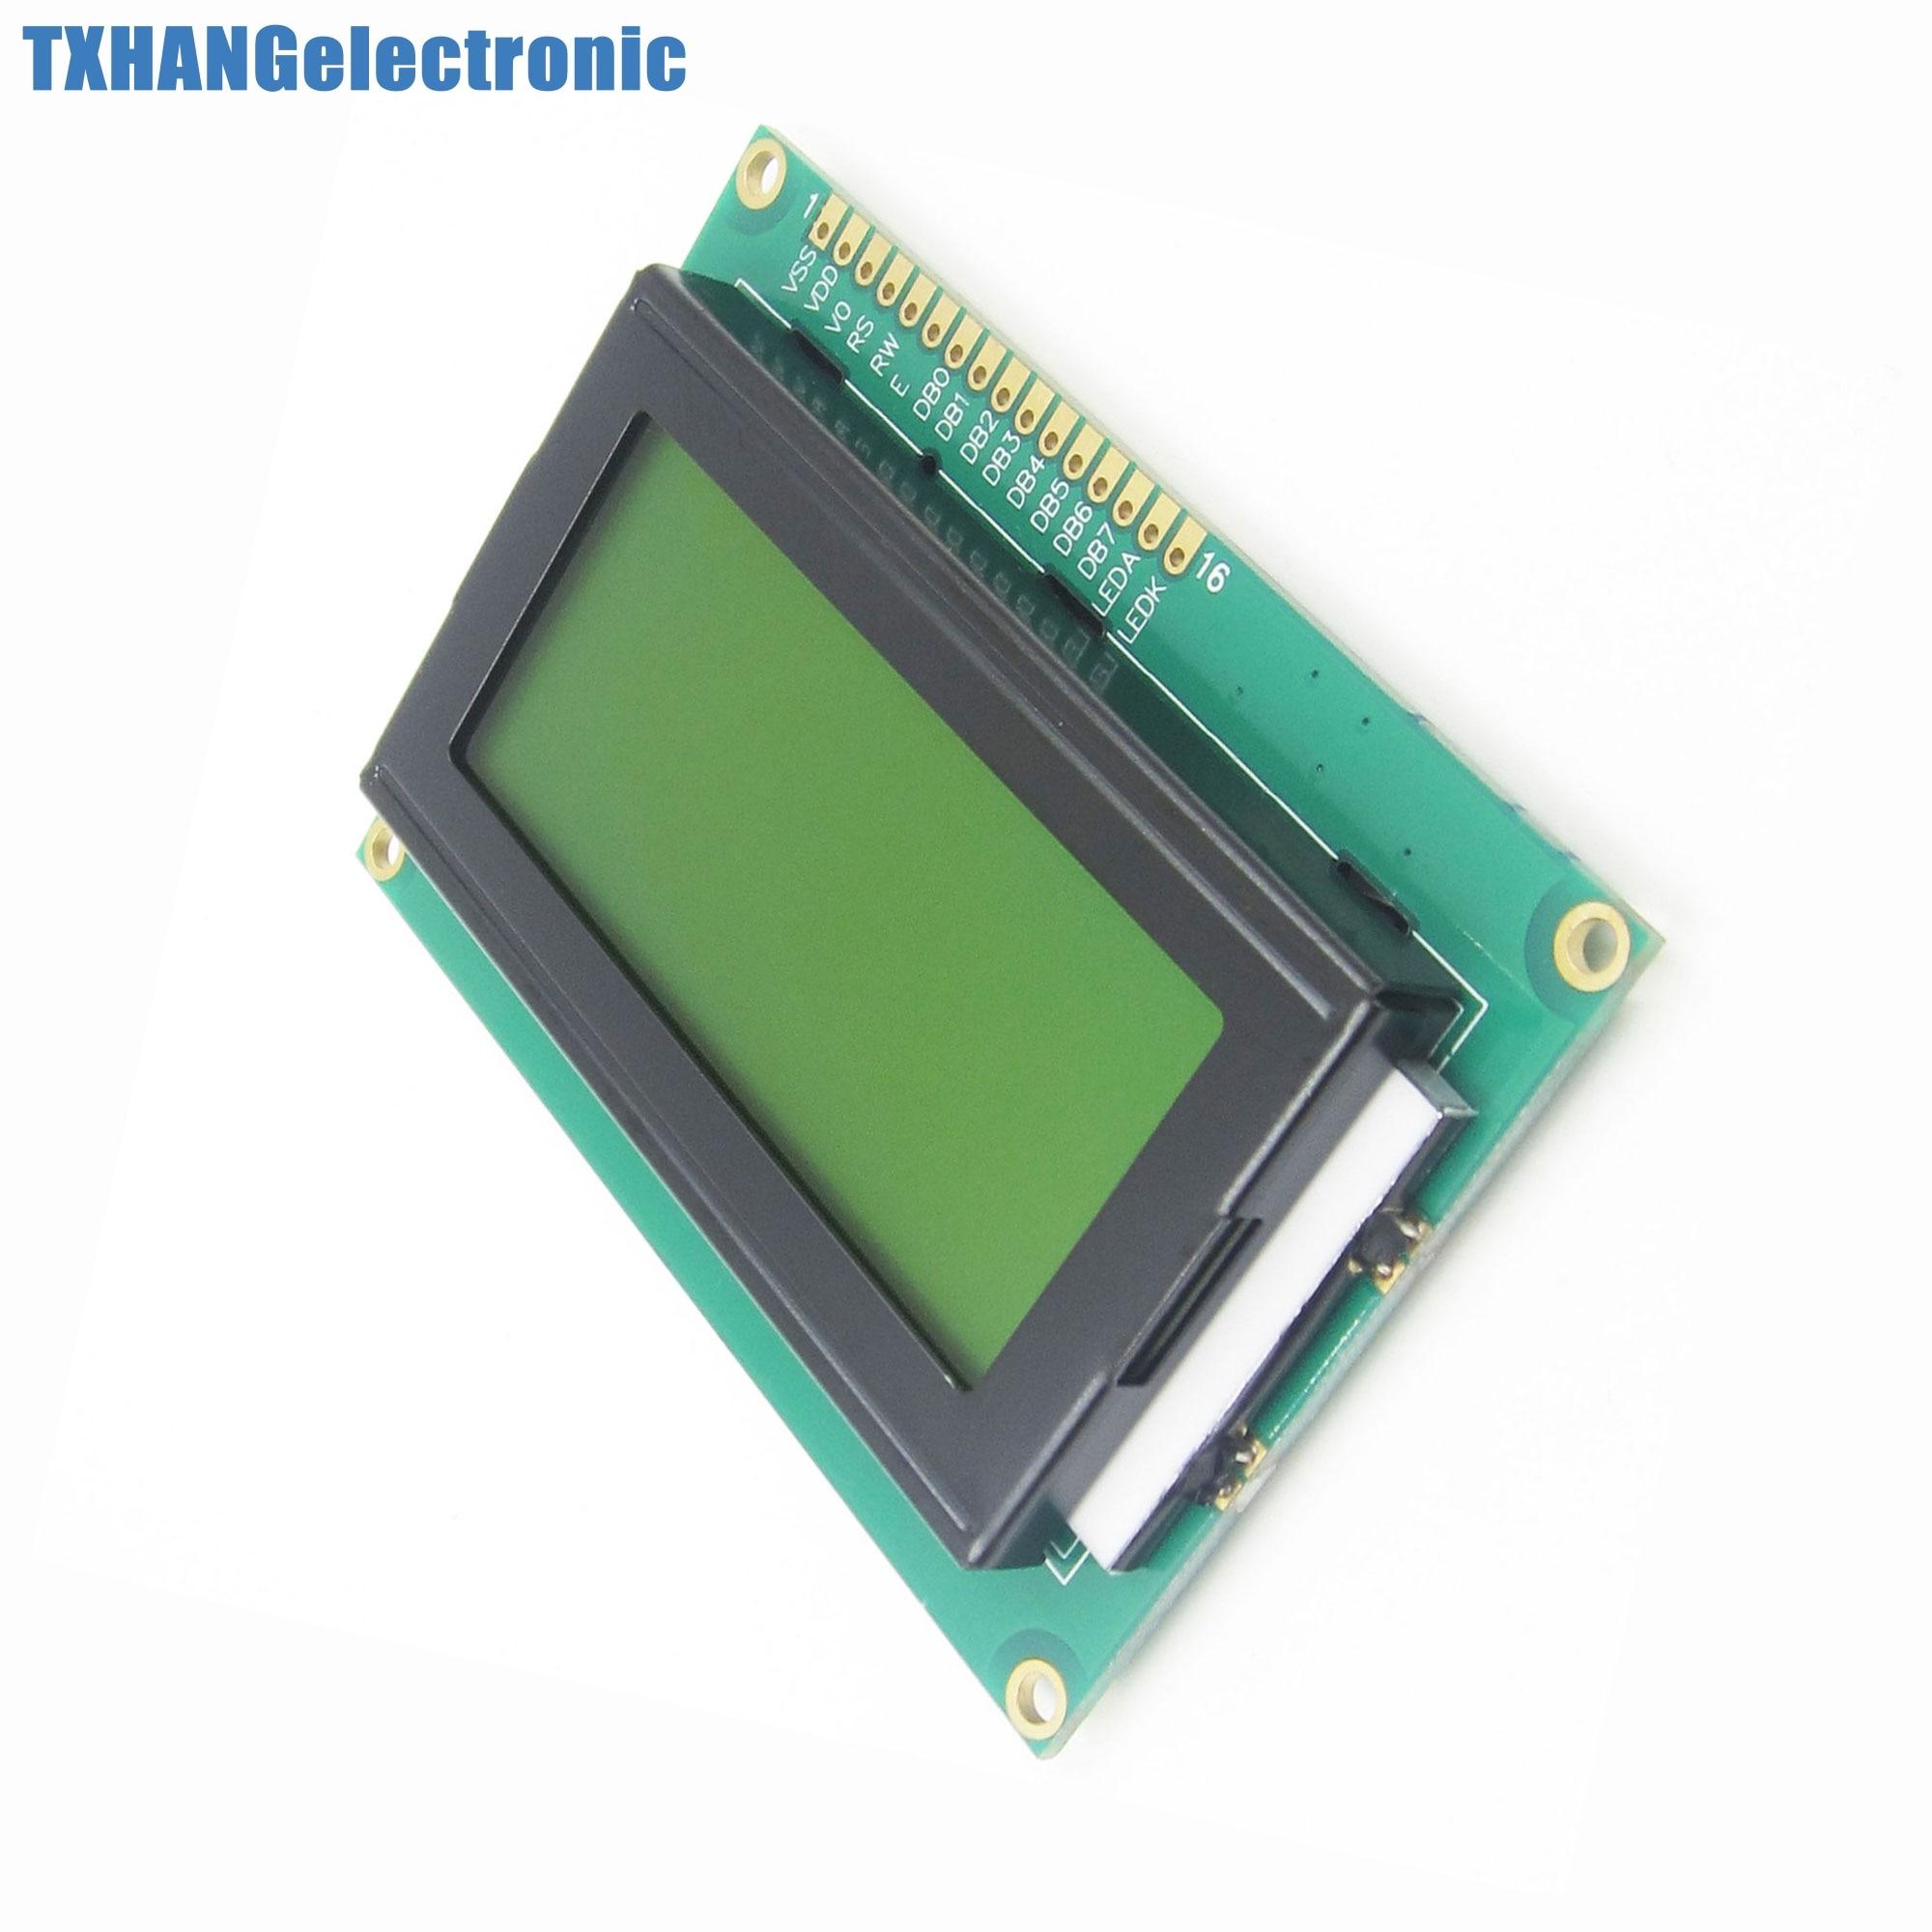 1pcs LCD1604 16x4 Character LCD Display Module LCM yellow Blacklight 5V